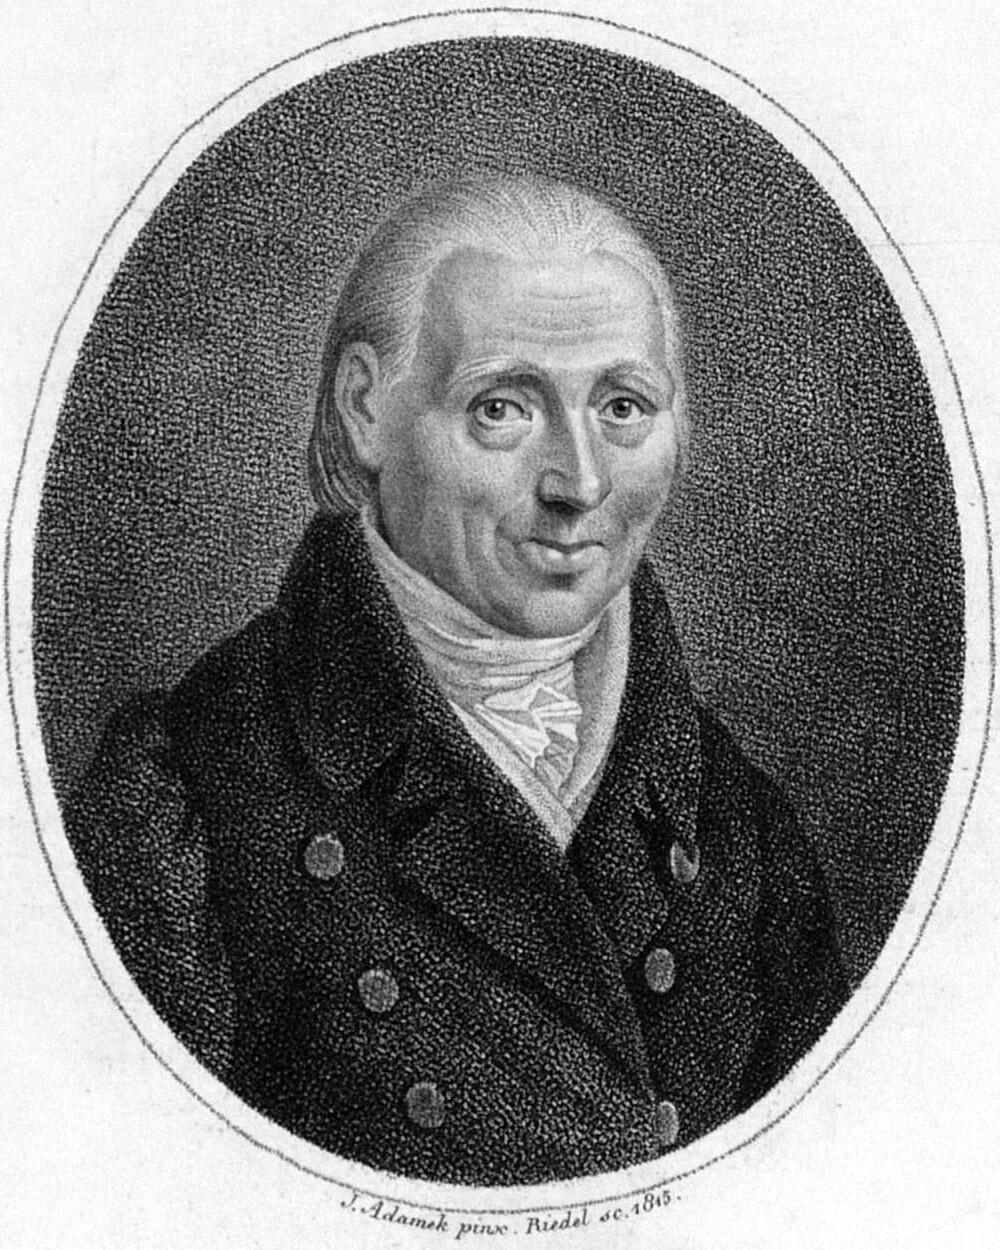 Johann Baptist Wanhal